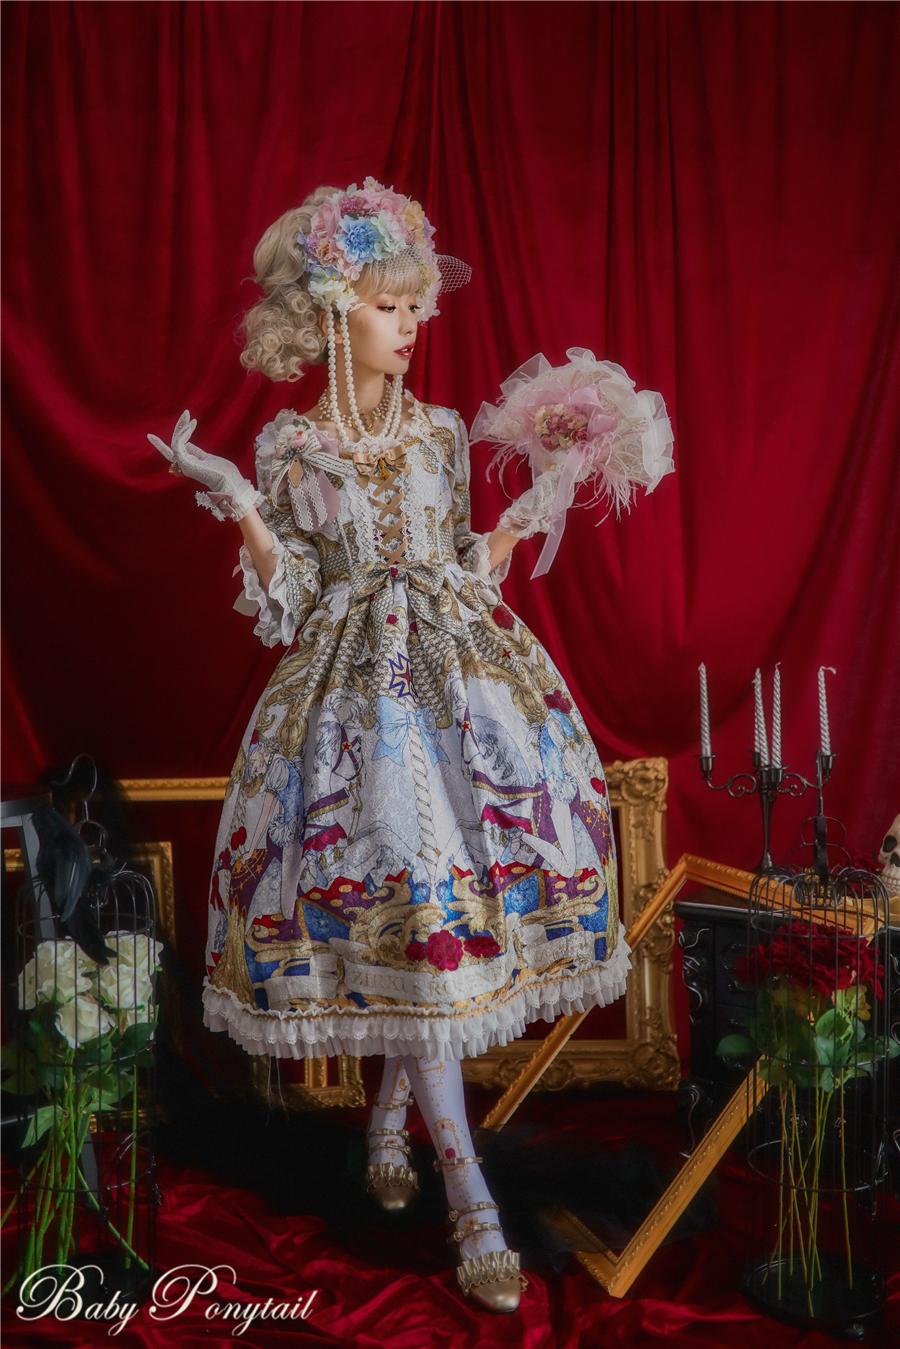 Baby Ponytail_Circus Princess_Silver OP_Kaka_07.jpg